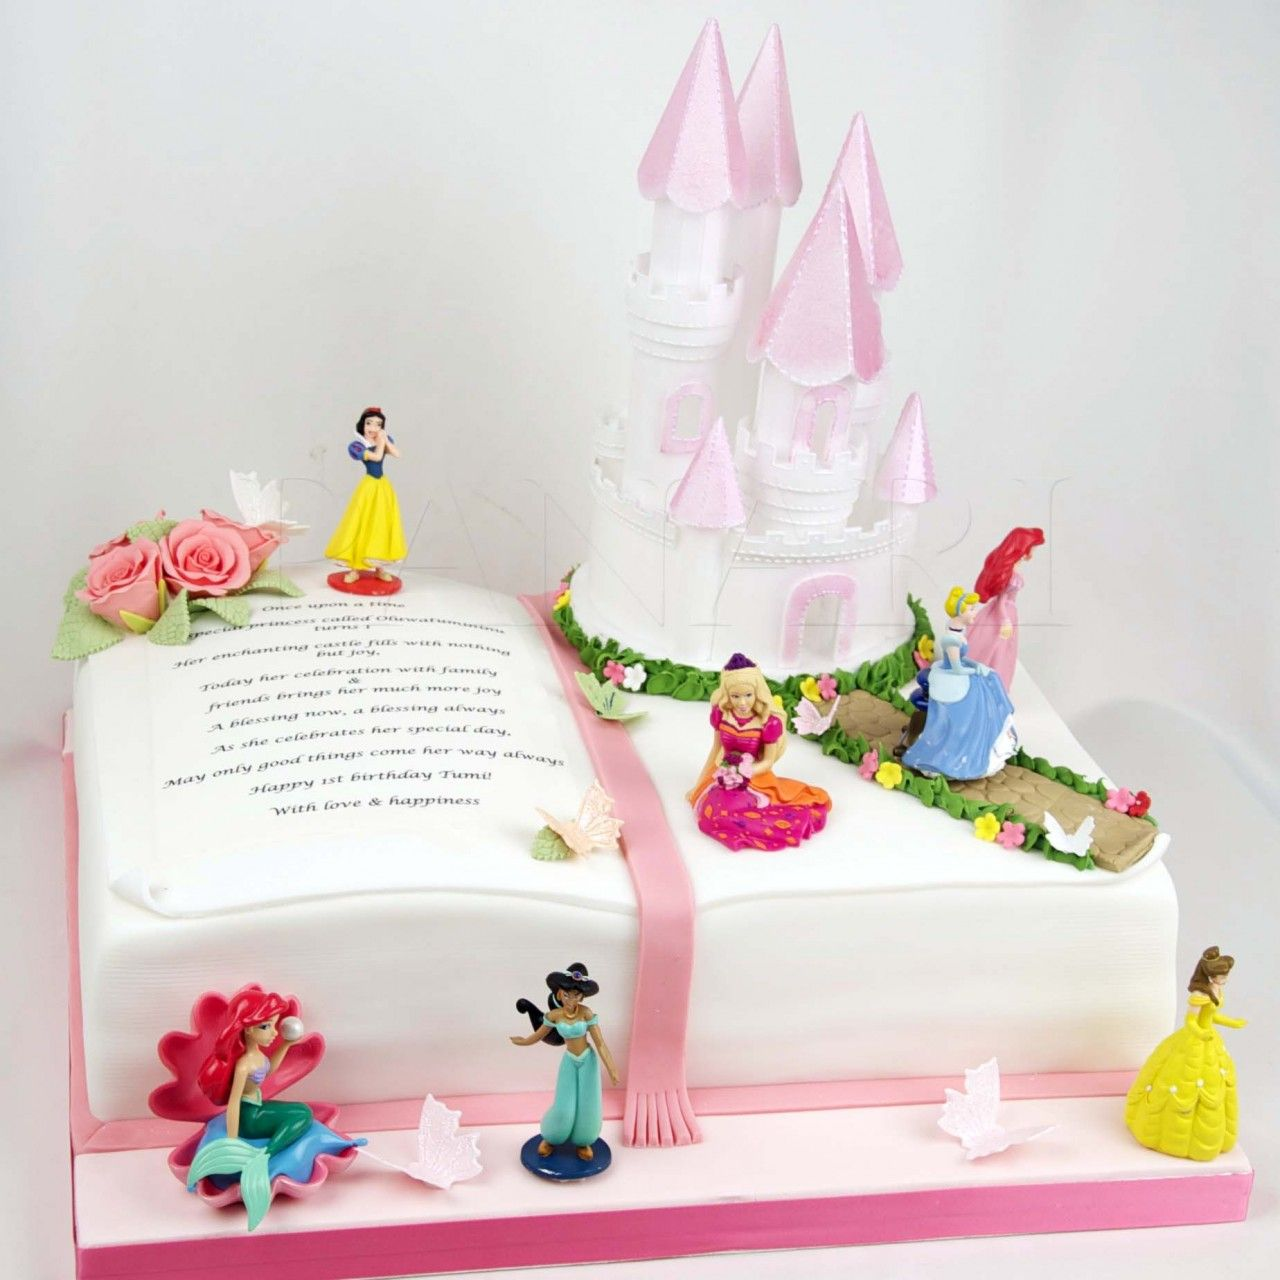 Princess Story Book Cake Bk0028 Panari Cakes Story book cakes tort